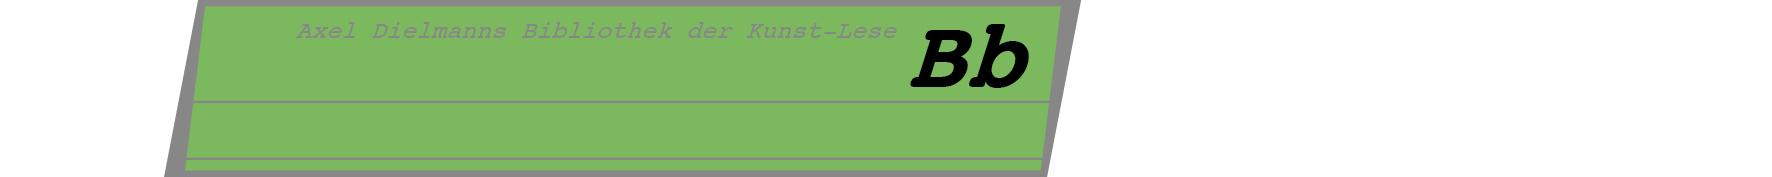 Kartei-B